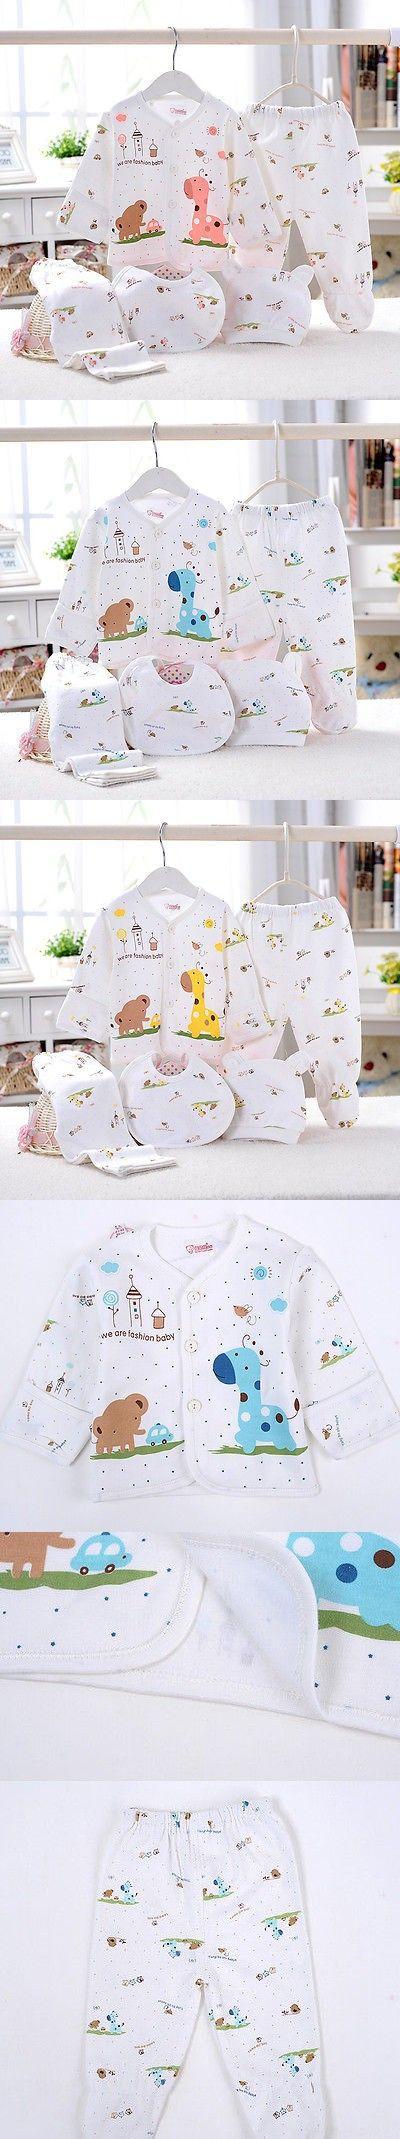 5PCS/set Newborn Baby Clothing 0-3 Month Boy Girls Cotton Cartoon Underwear Clothes Wholesale $7.15